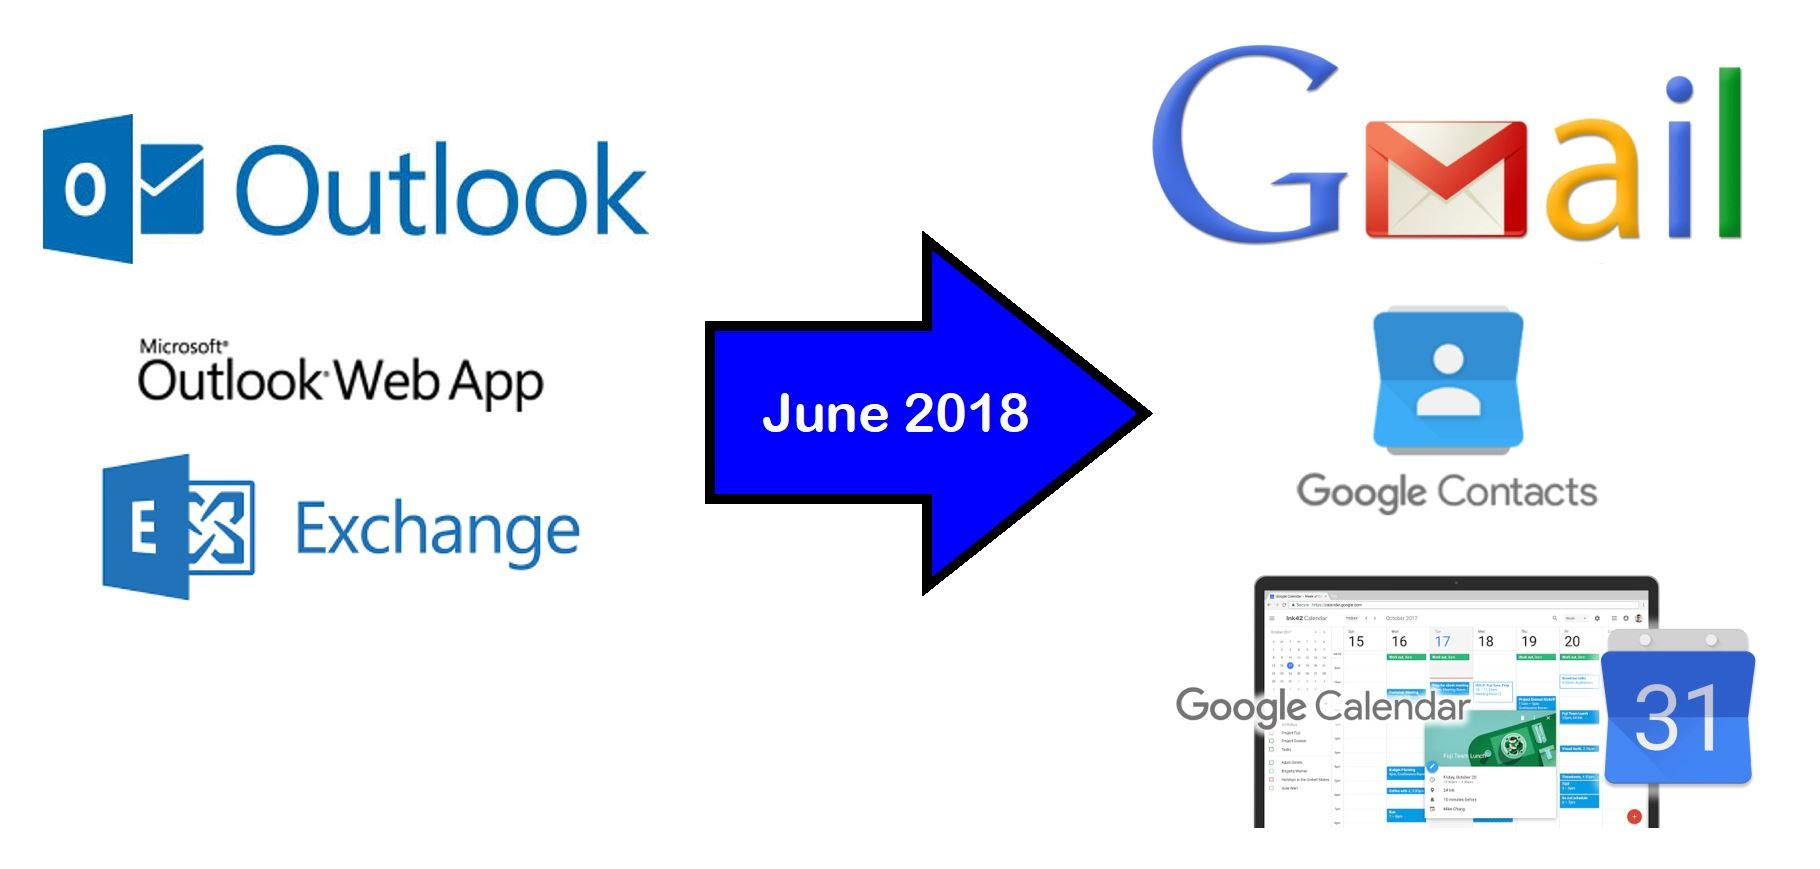 Google trainings